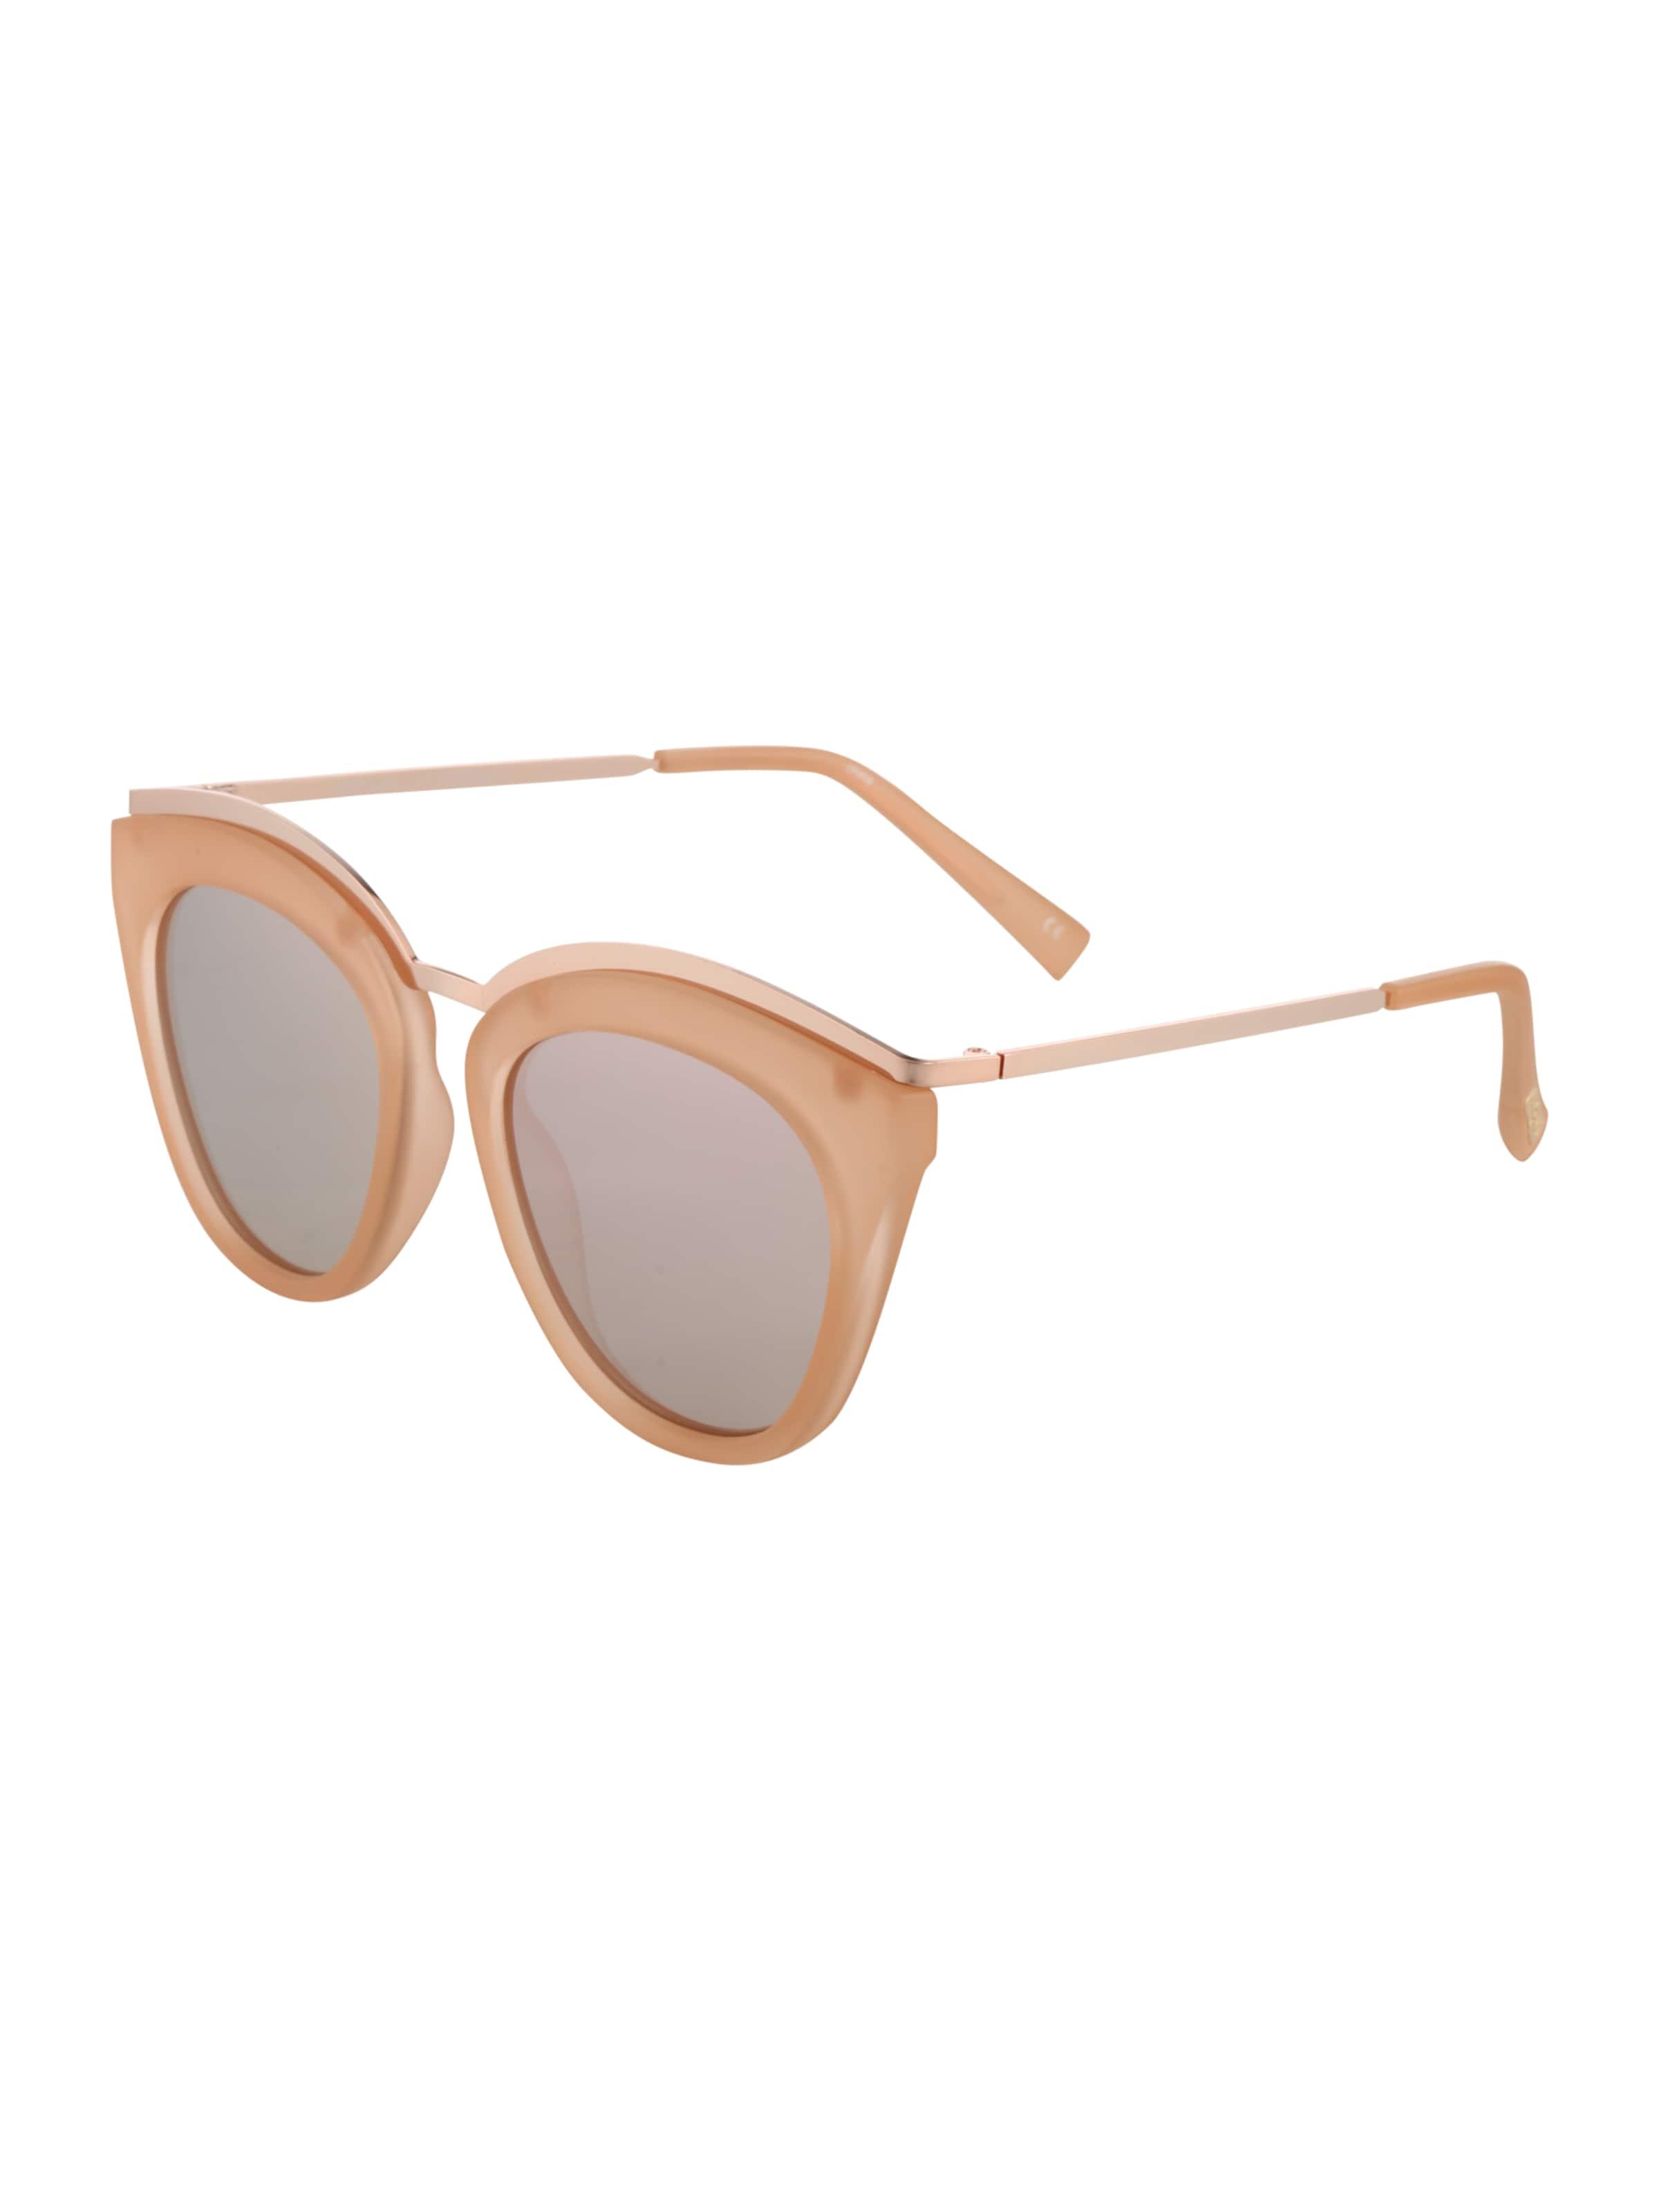 Le Sonnenbrille In Apricot 'eye Slay' Specs 5L3q4AjR